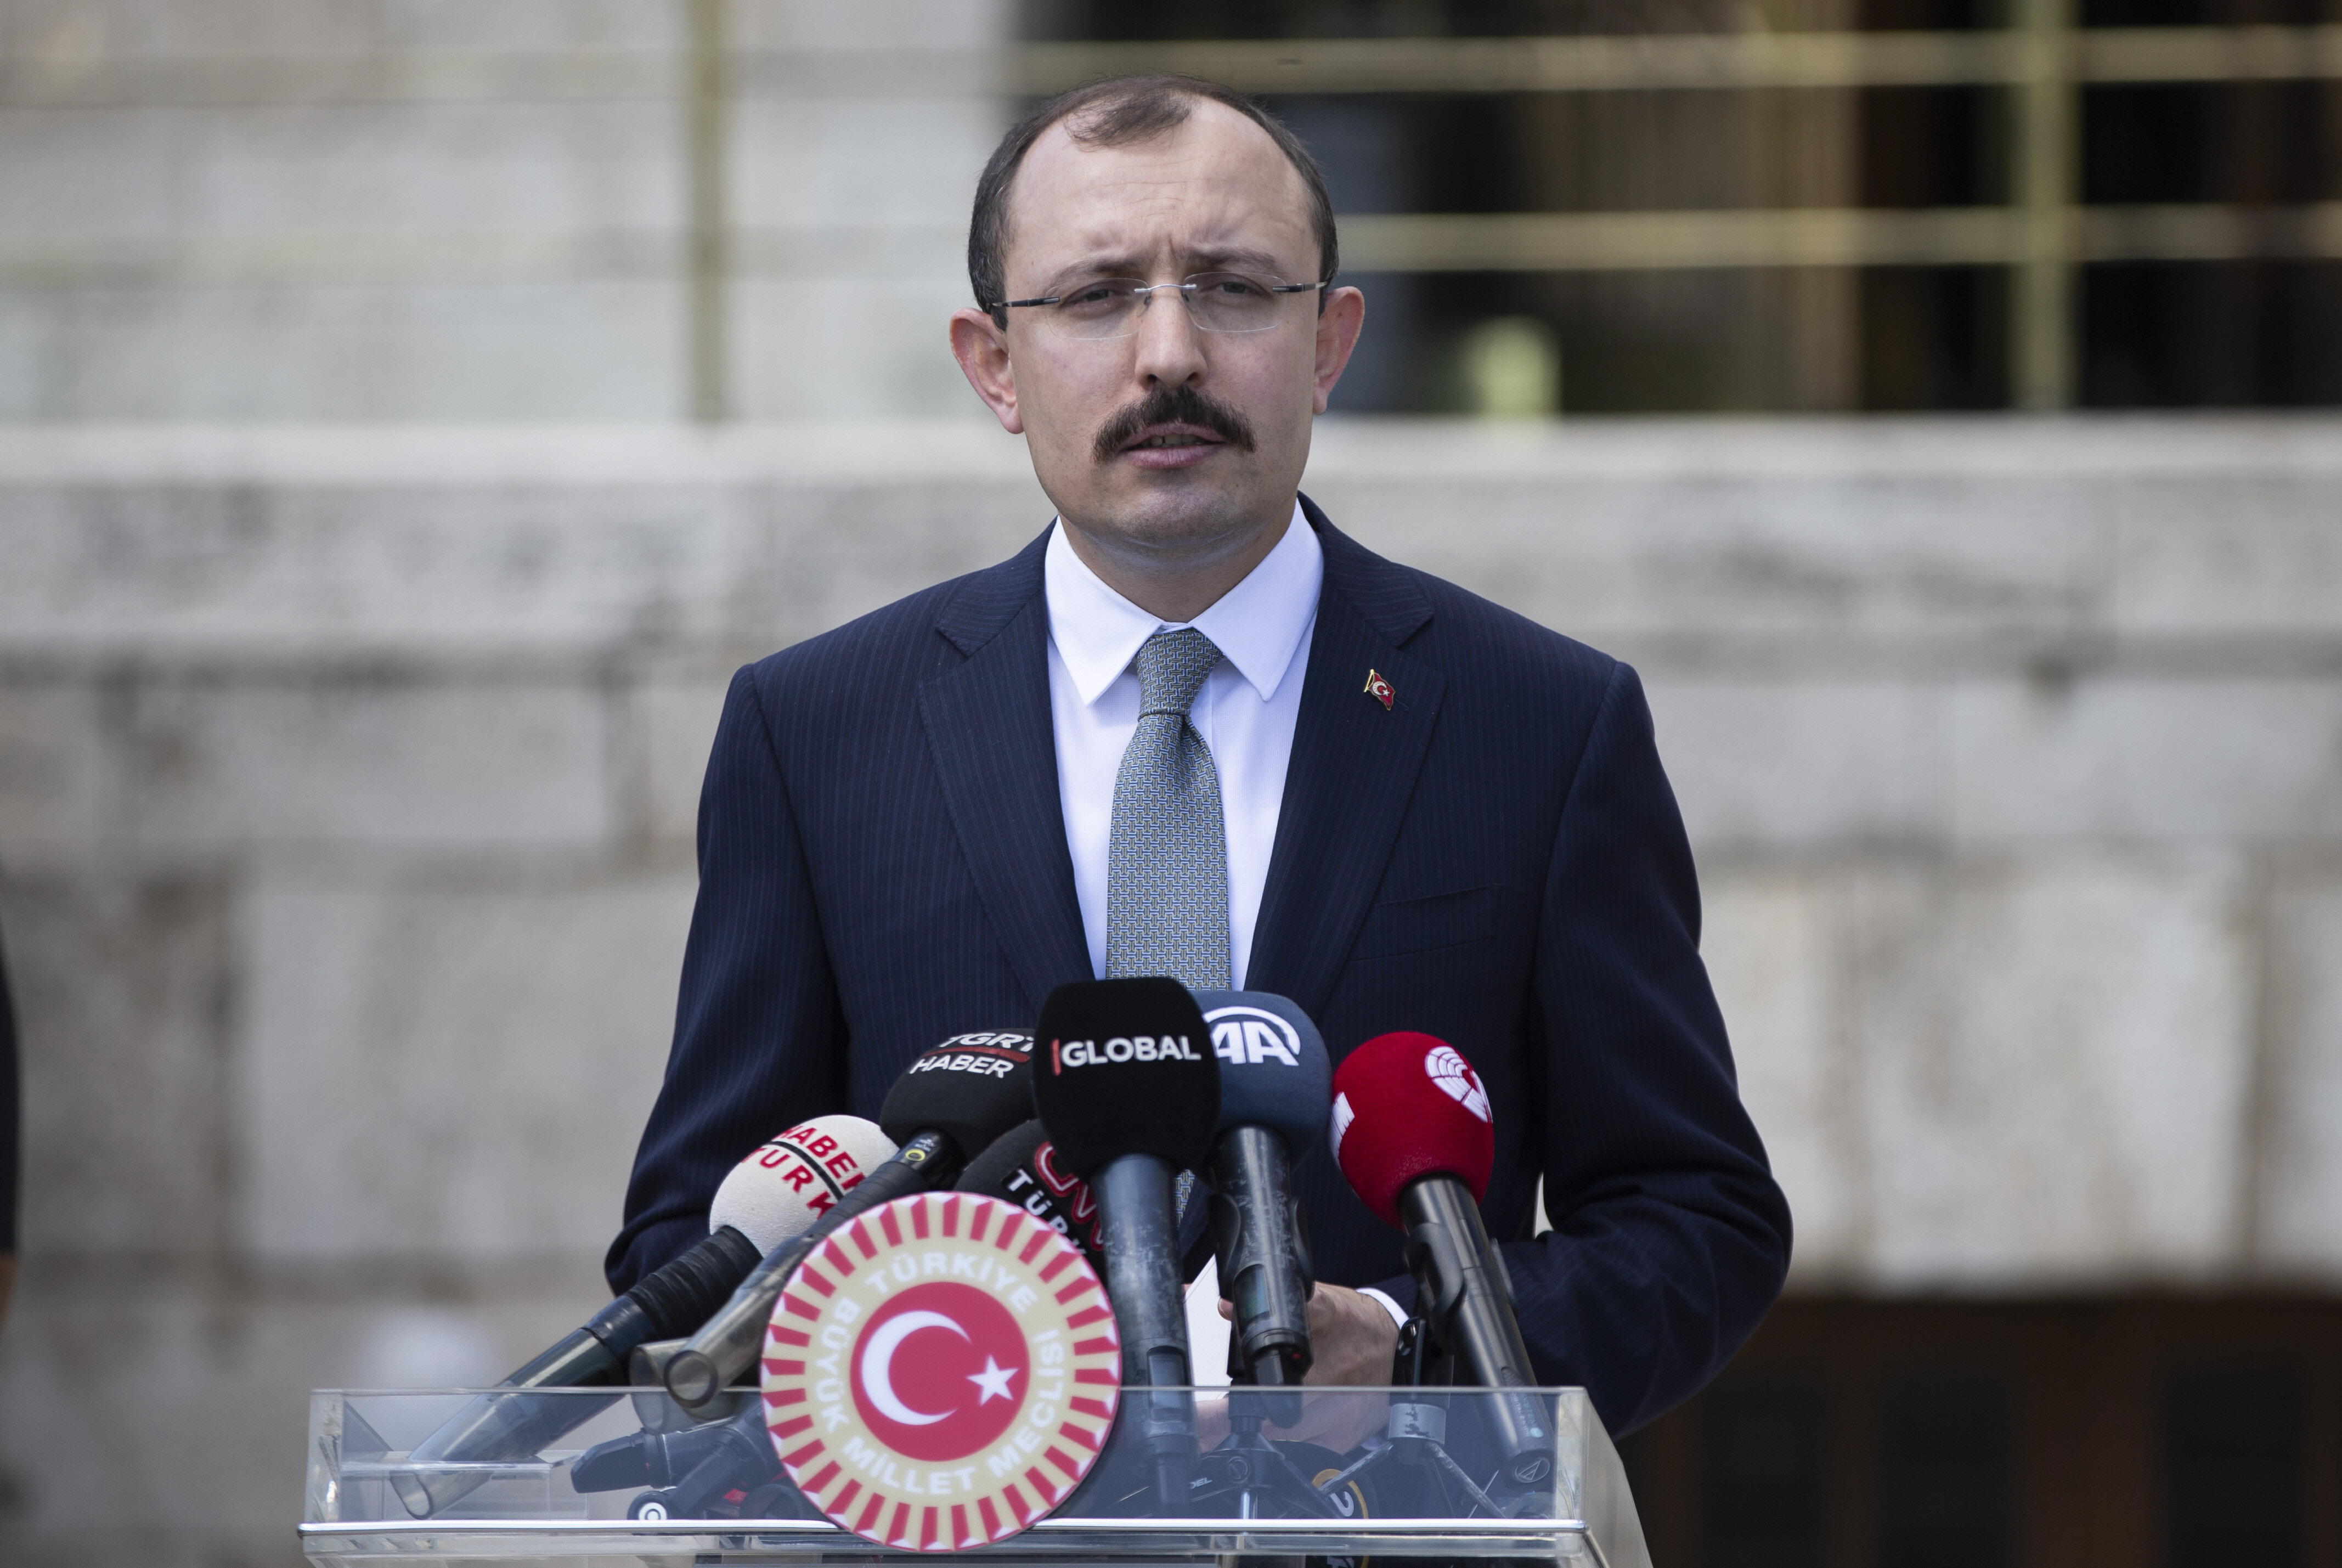 AK Parti Grup Başkanvekili Mehmet Muş (arşiv).